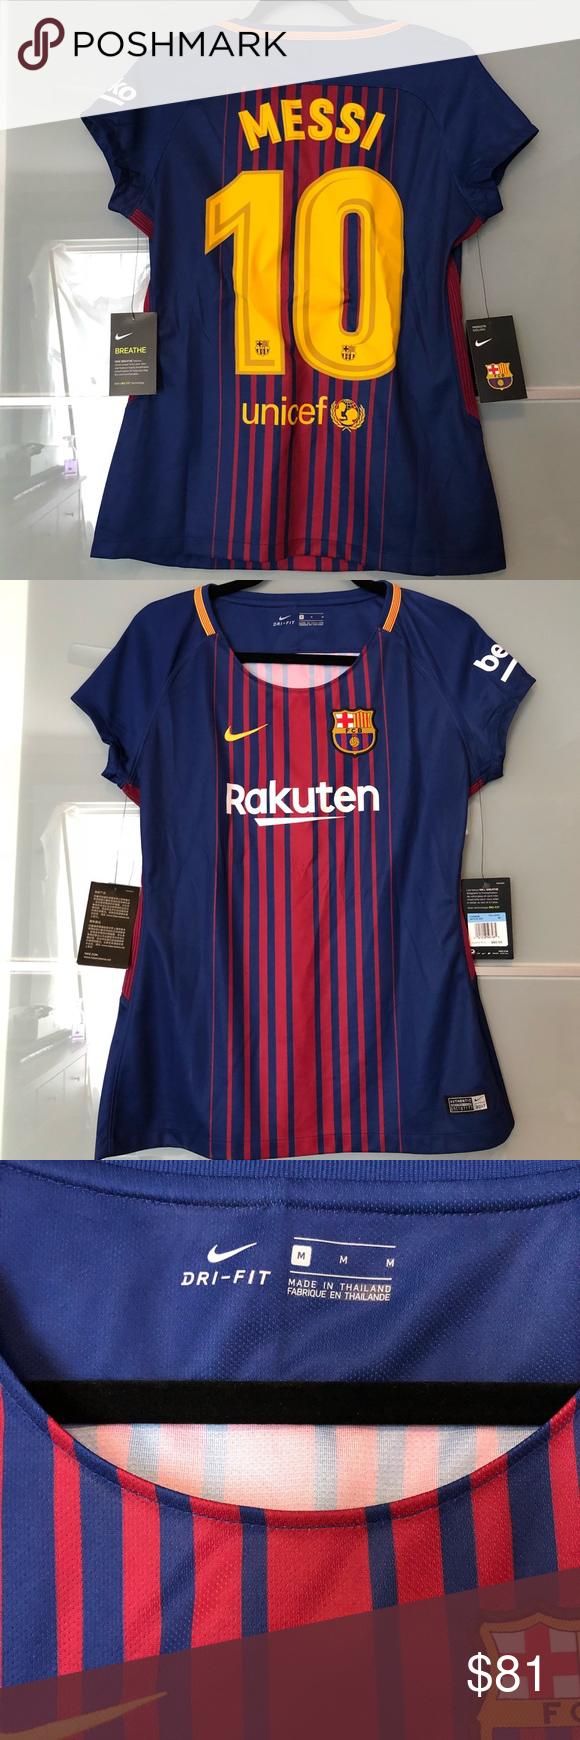 buy popular 2c9d3 09681 Nike Barcelona Messi Jersey 2017-2018 — Women's M Customized ...